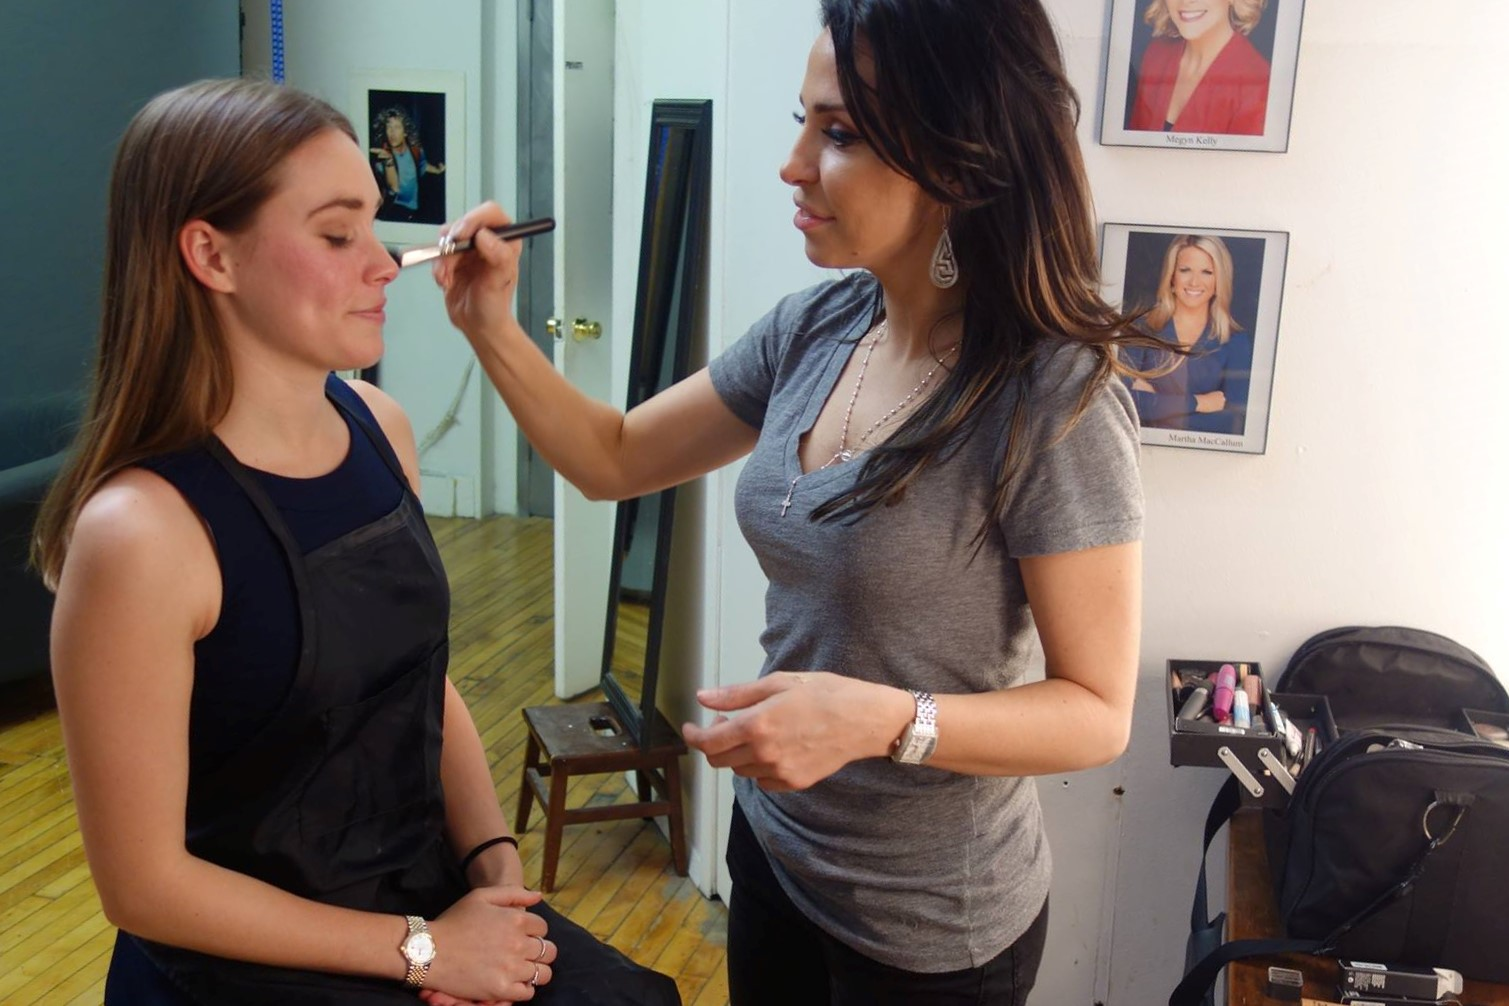 Nicolette Brycki putting makeup on a Branding & Headshot client.